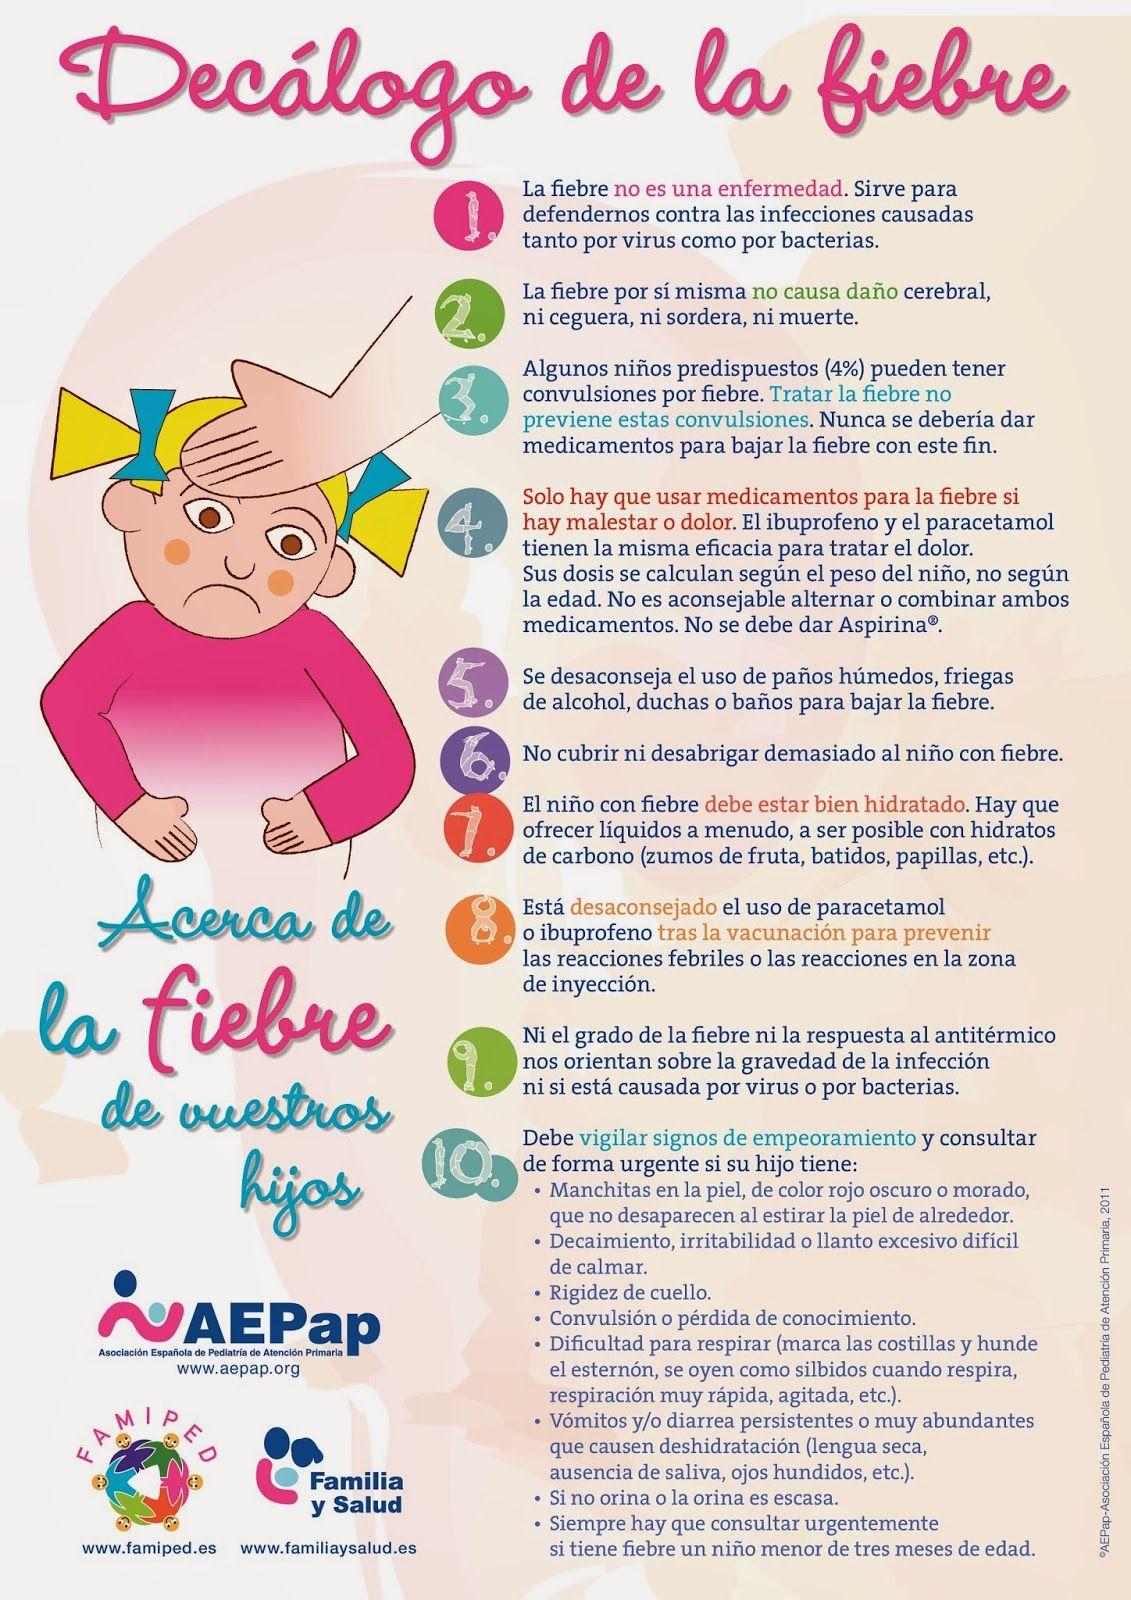 Decalogo Fiebre Page 0 Jpg 1131 1600 Pediatric Nursing Nurse Love Little Babies